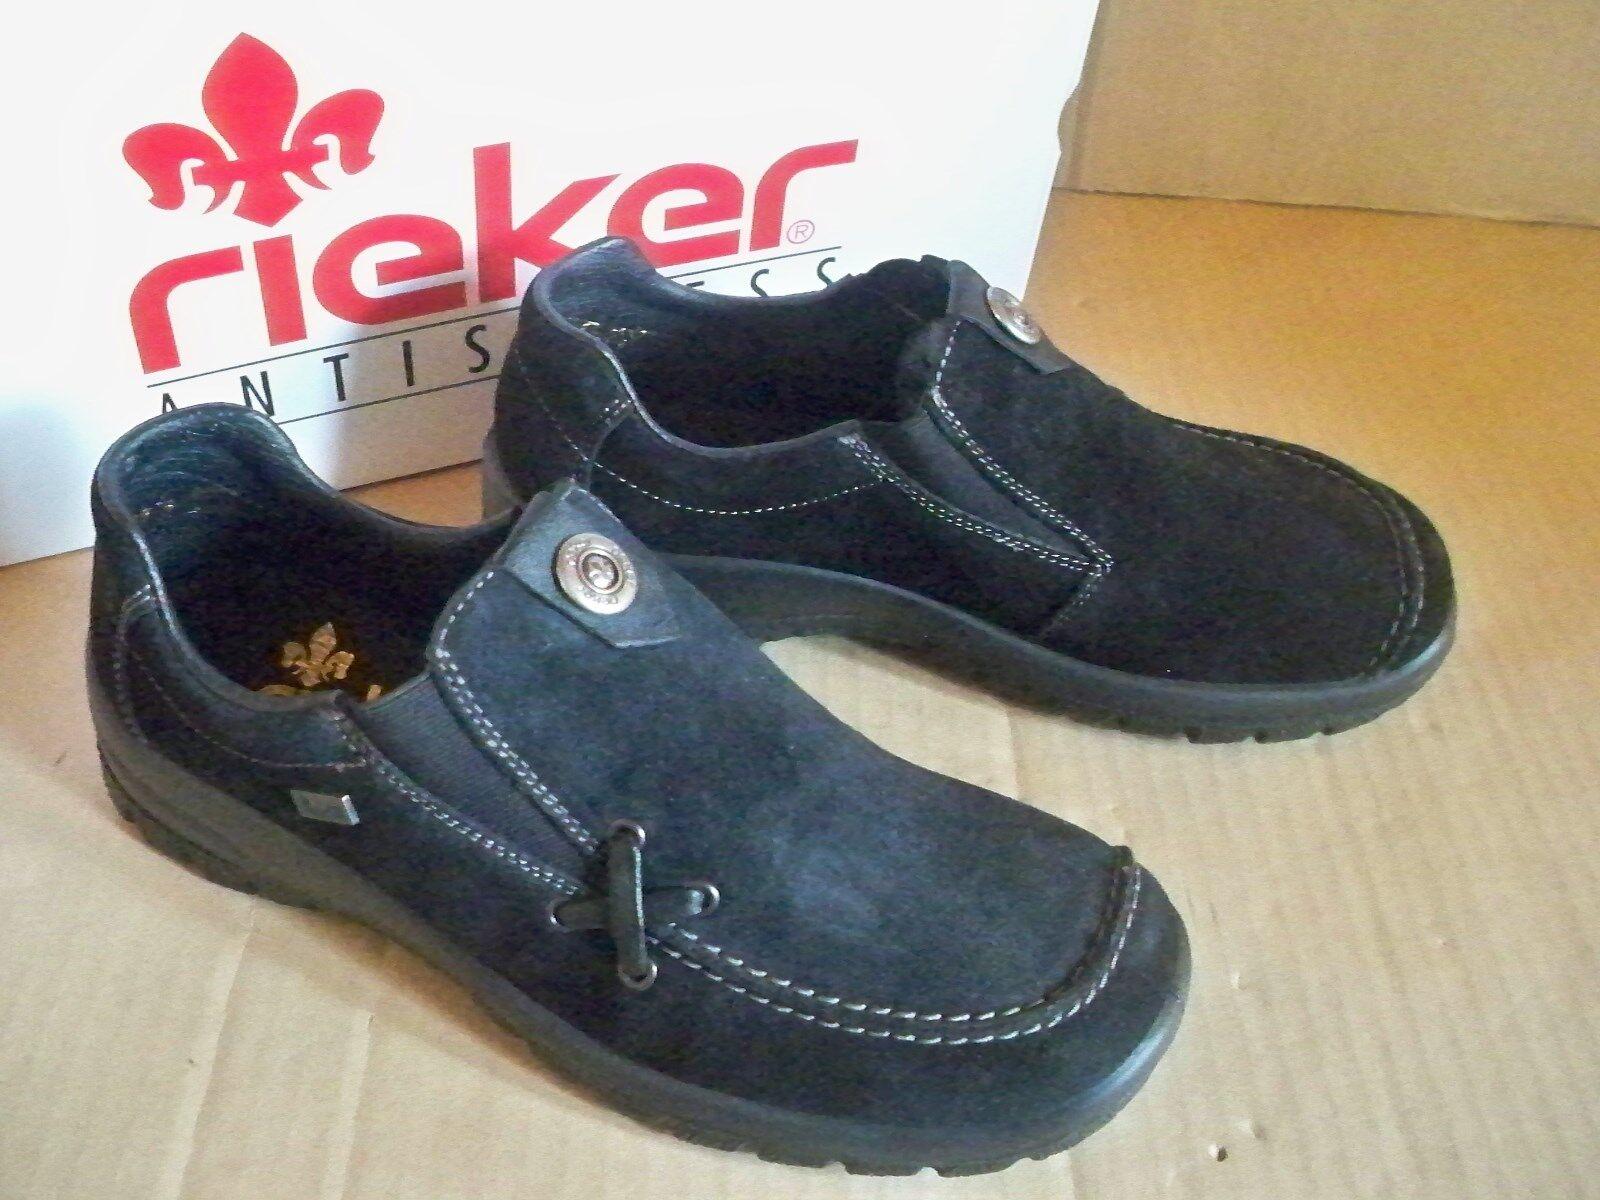 rieker Komfort Slipper mit riekerTEX Membran schwarz L7154-00